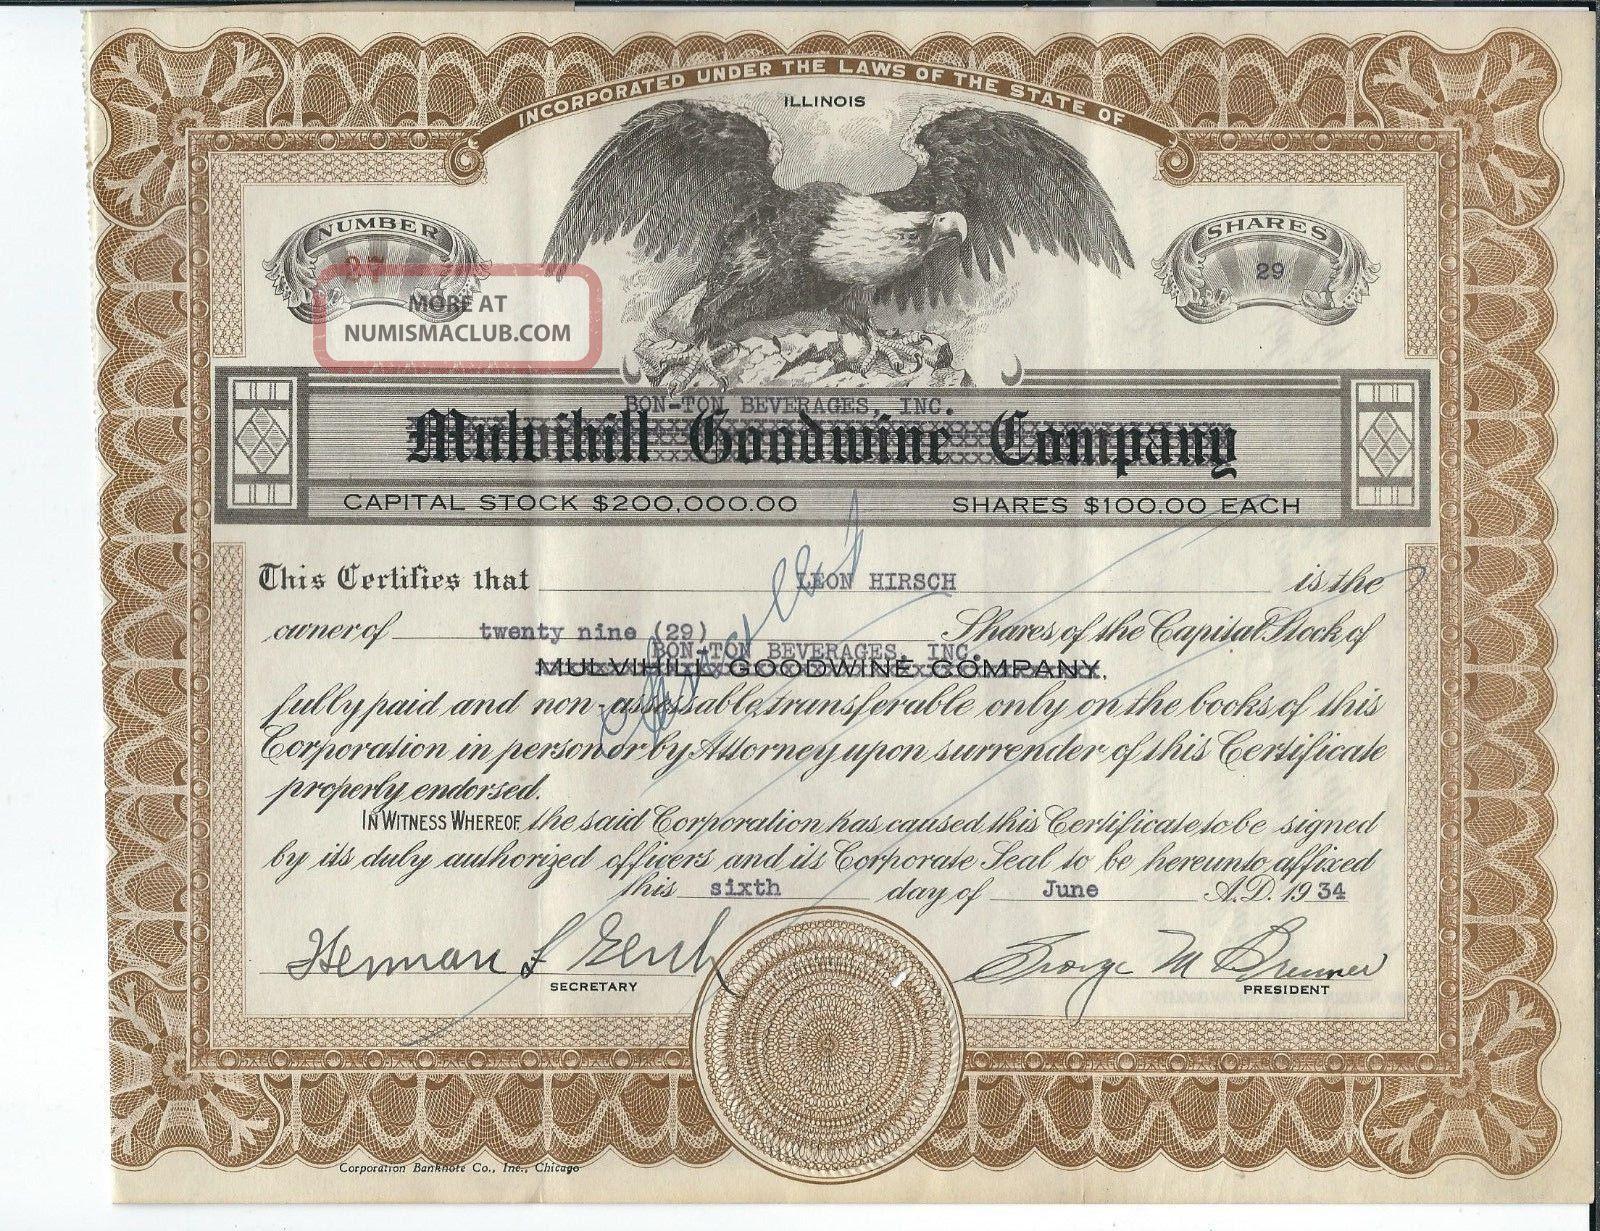 Mf - 029 - Bon - Ton Beverages,  Stock Certificate,  1934,  Waukesha,  Wisconsin Canceld Stocks & Bonds, Scripophily photo